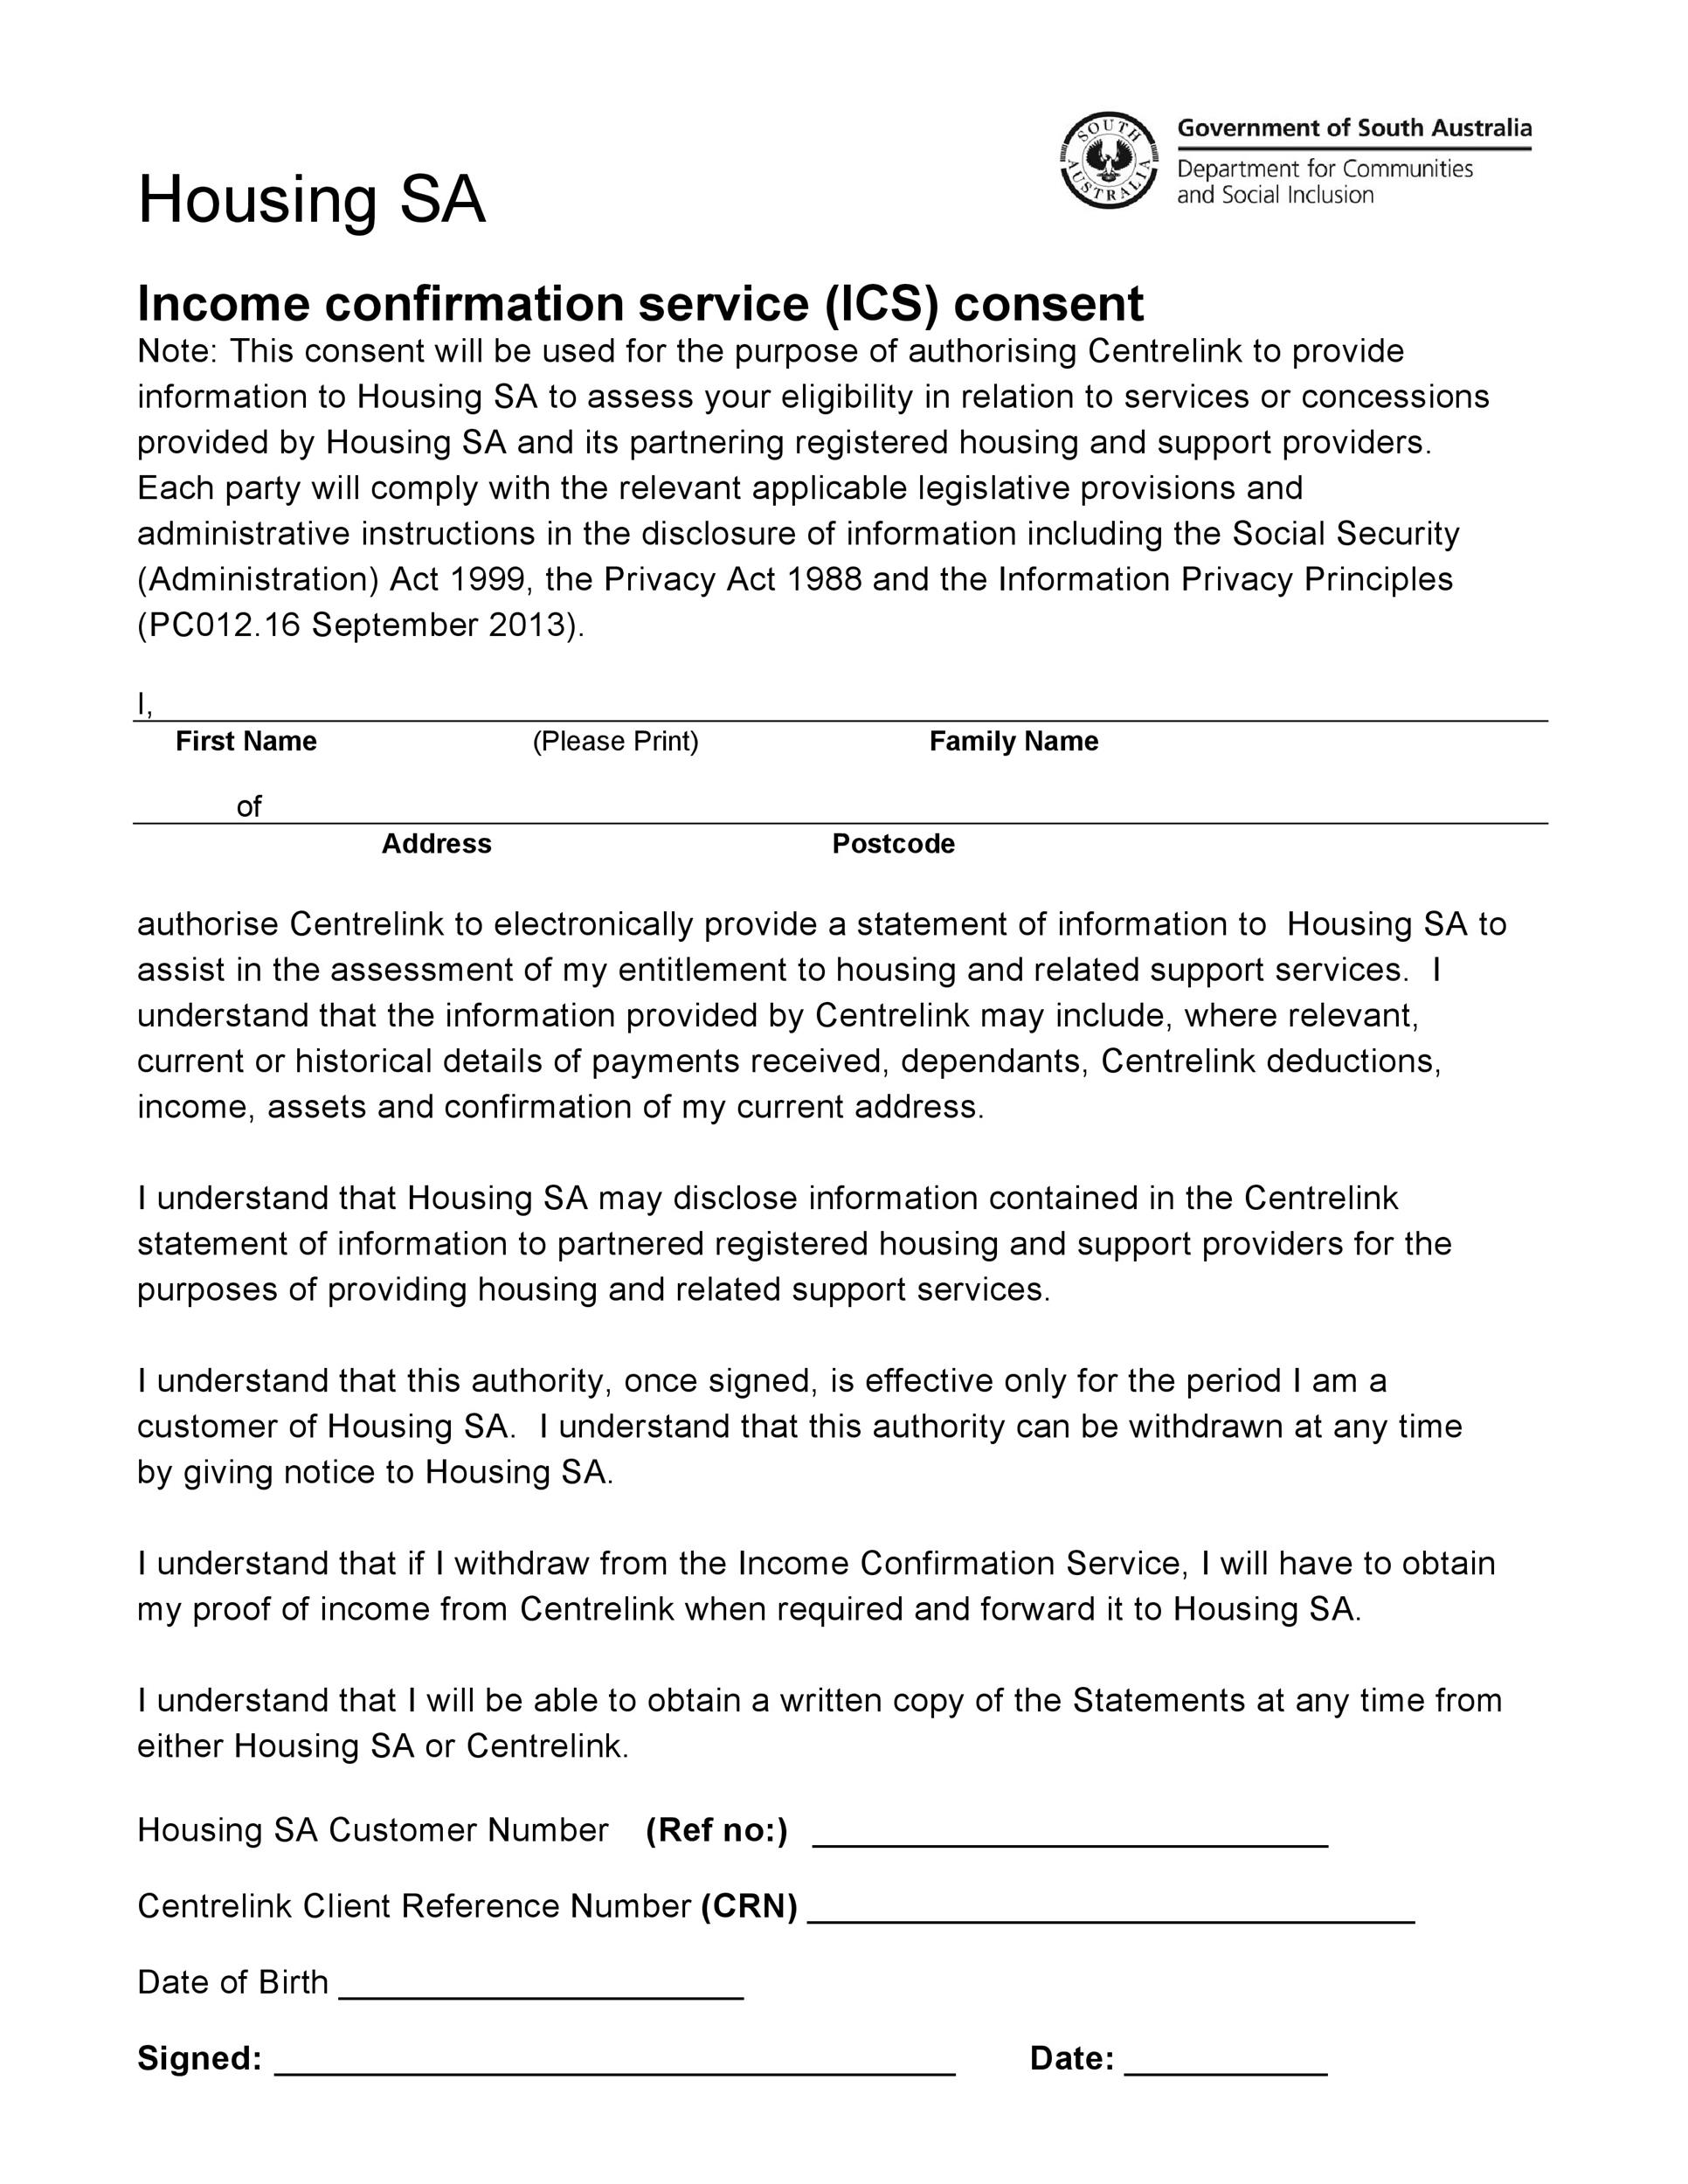 Free income verification letter 39